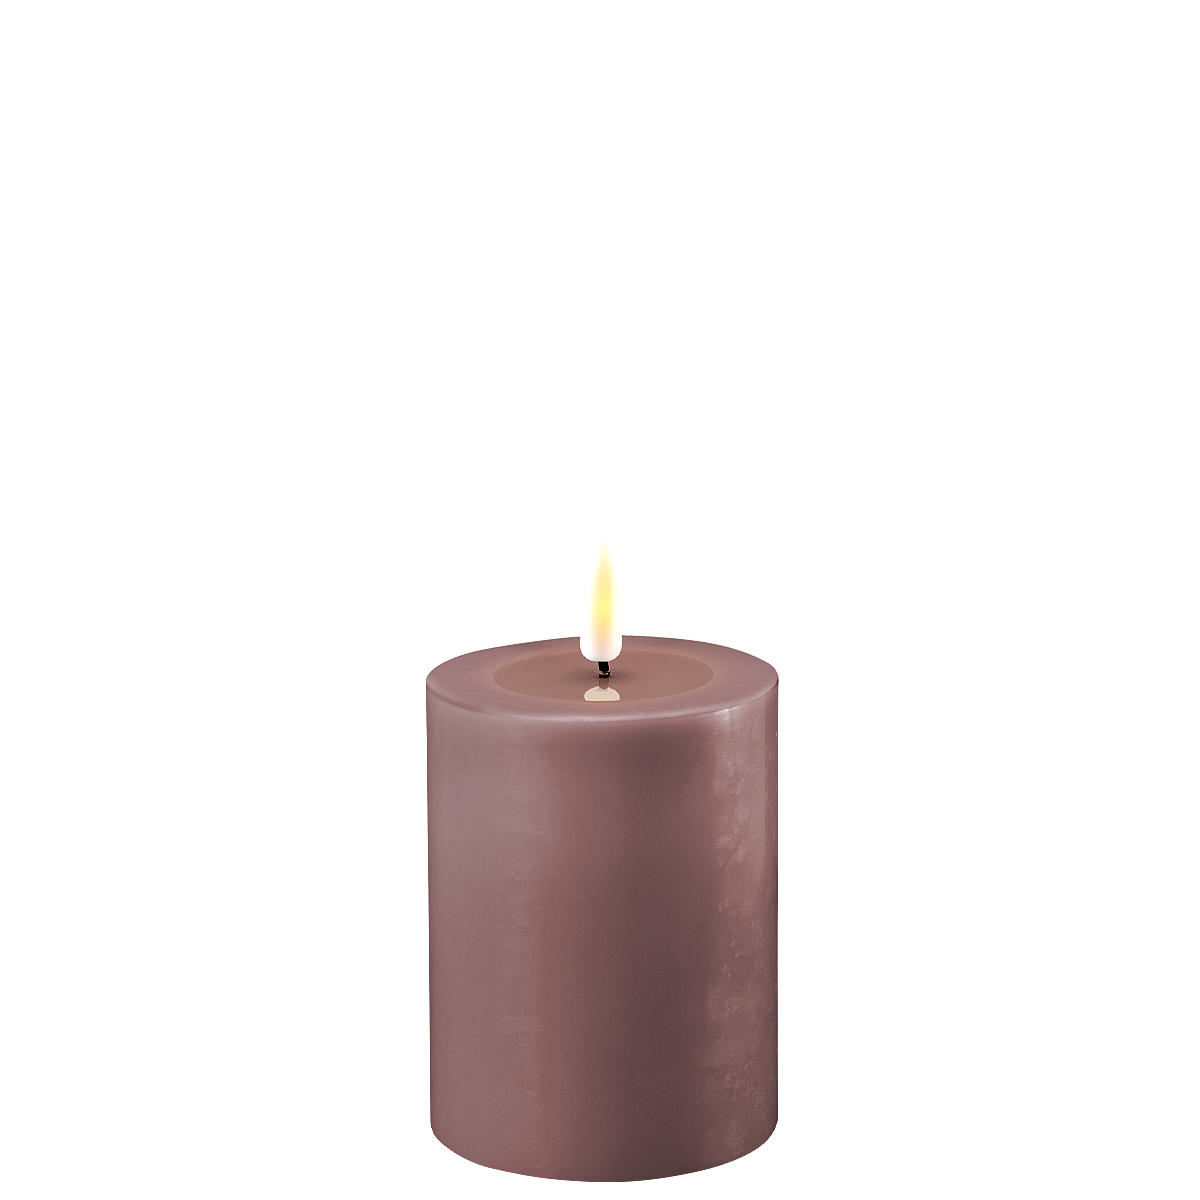 Lys lilla led-kubbelys 7,5x10cm